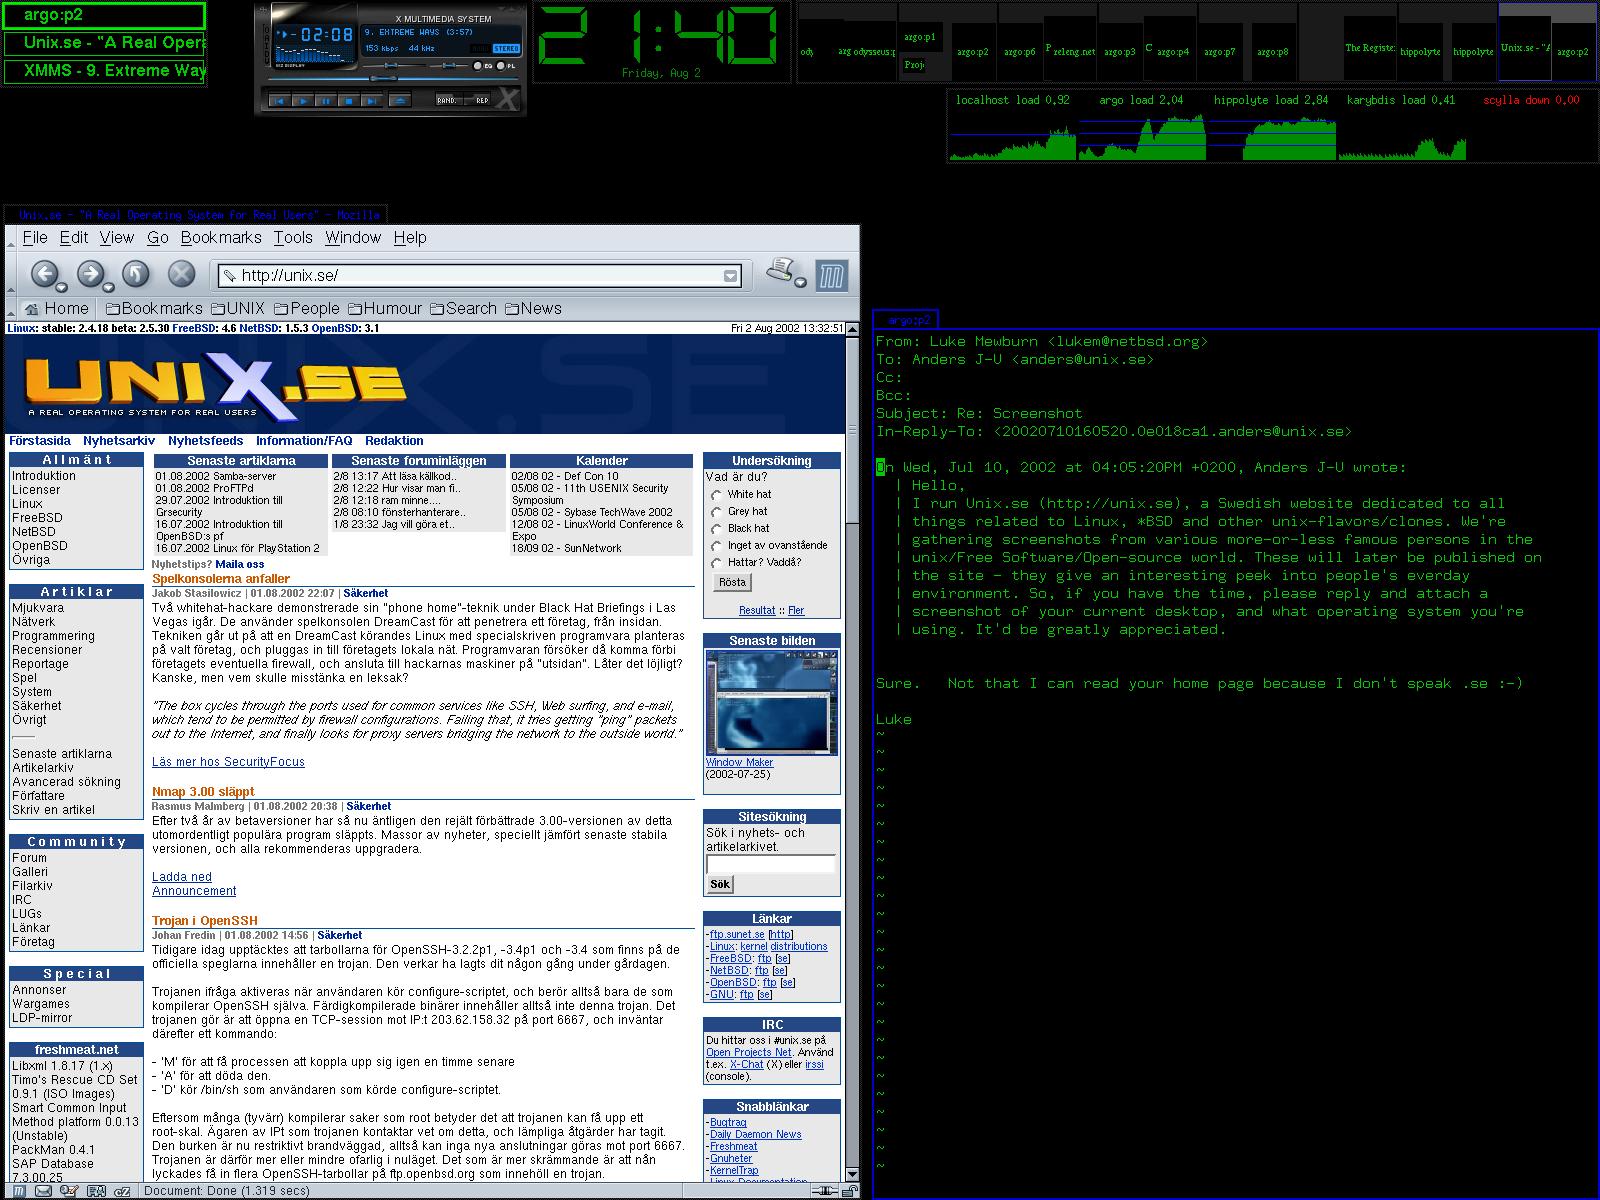 Luke Mewburn的电脑桌面,截图于2002年8月